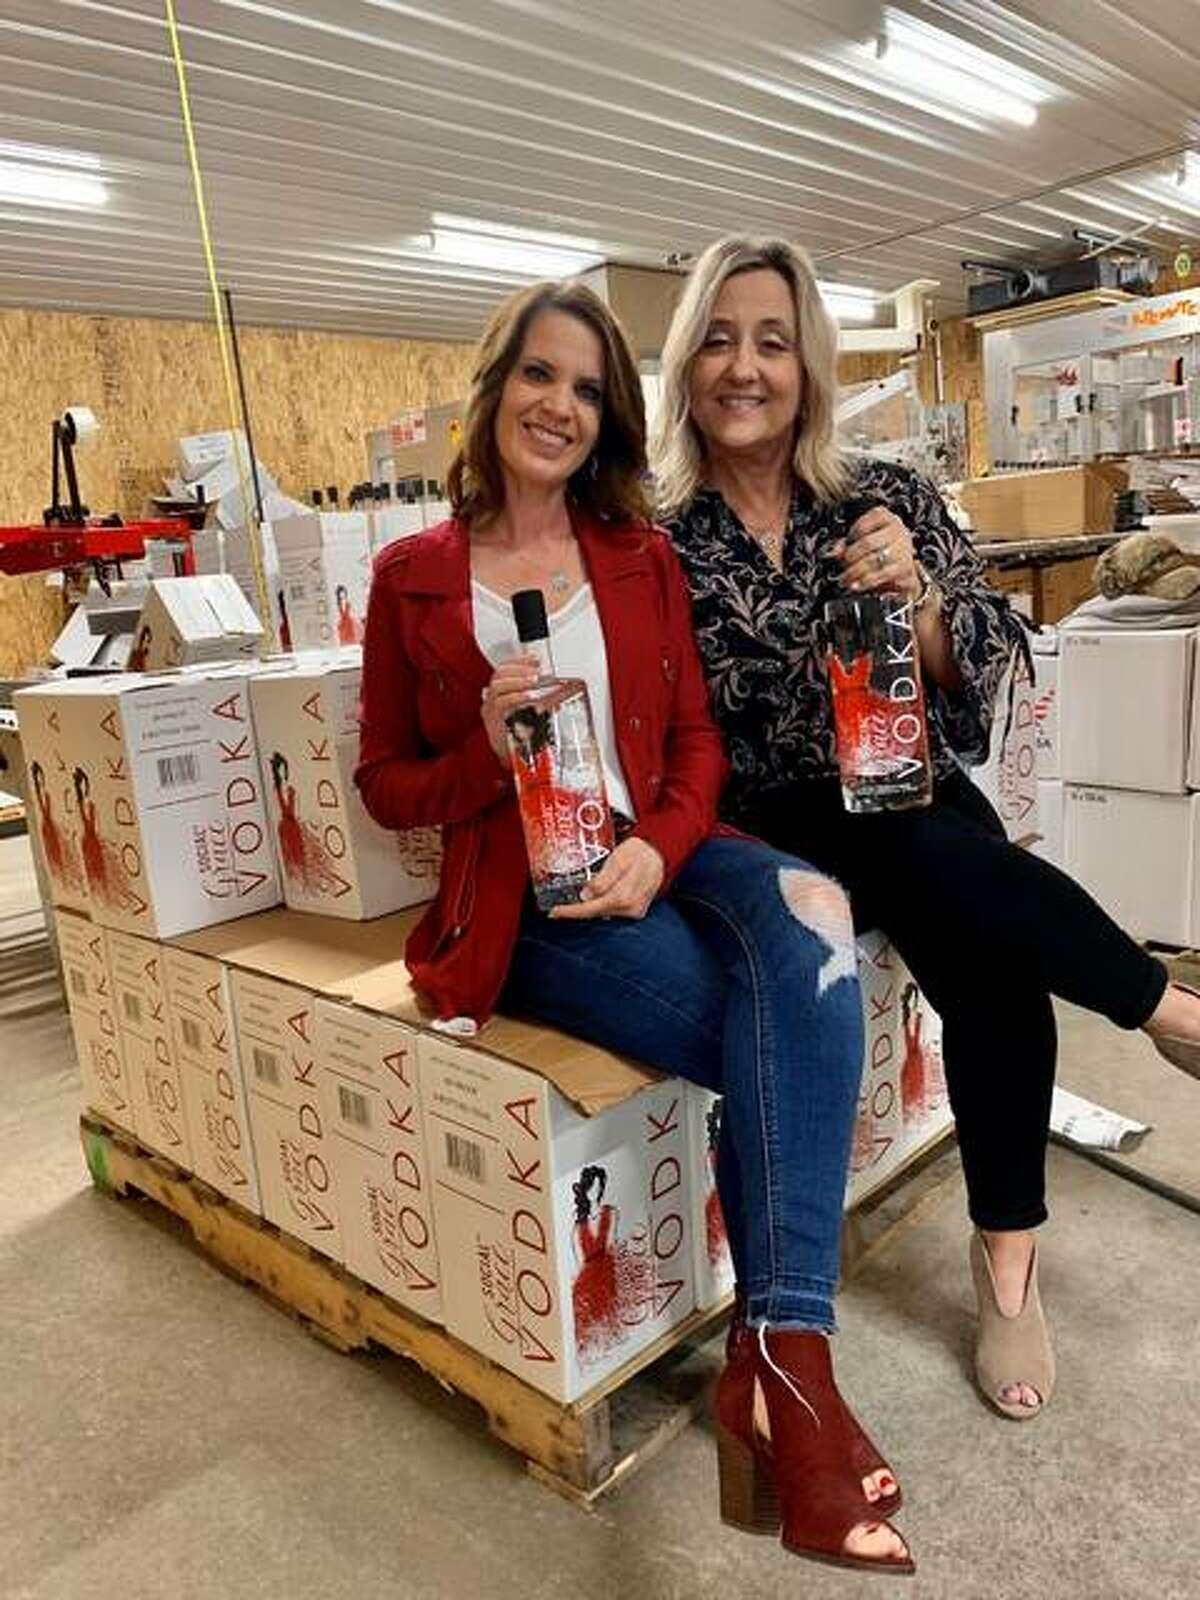 Social Grace Vodka co-owners Christa Guilbeault, left, and Denise Arendell.